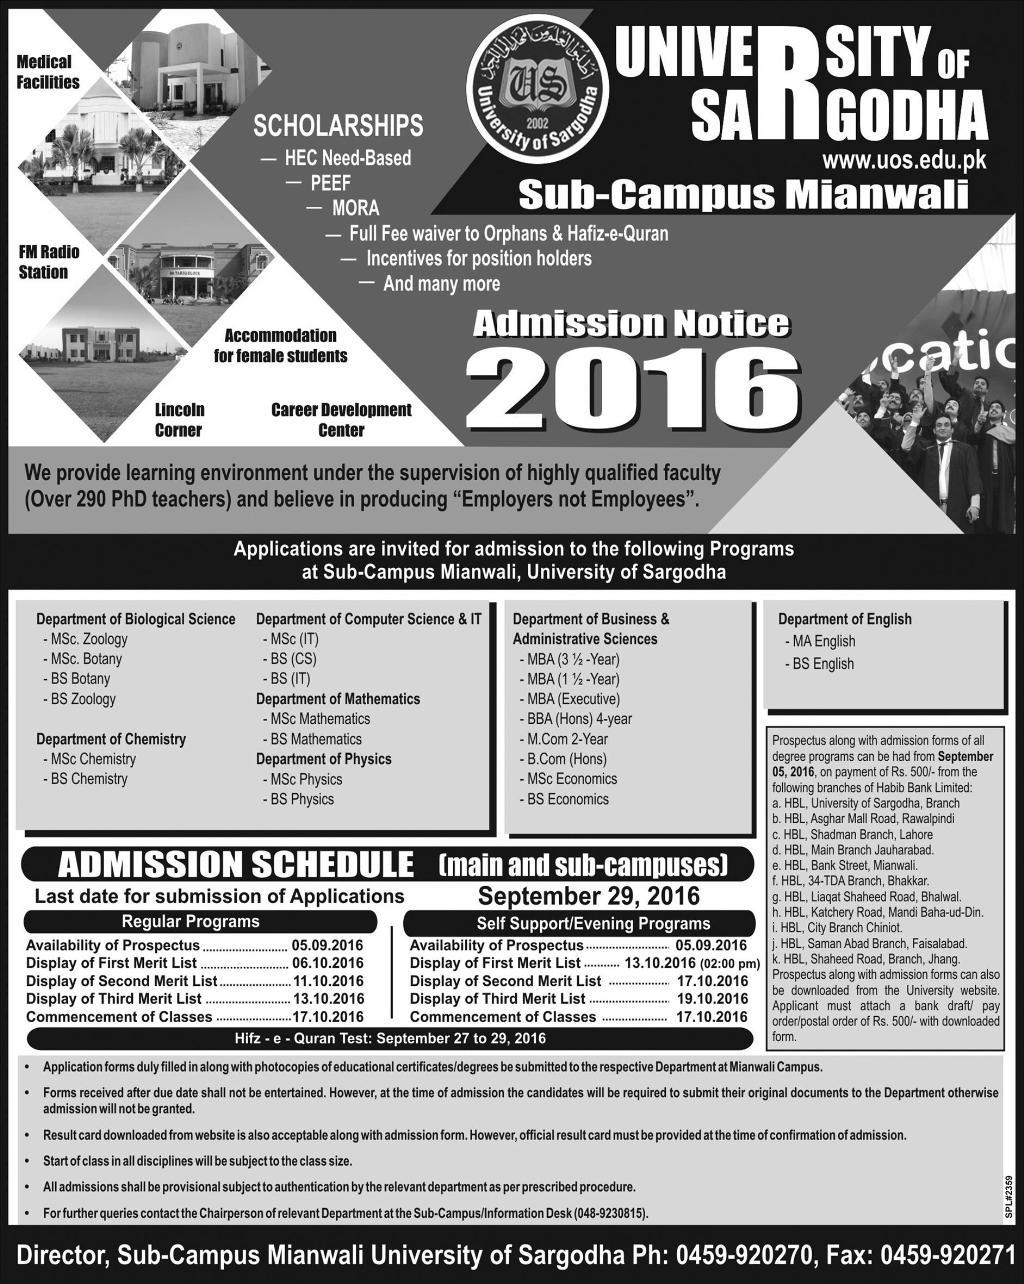 Sargodha University Sub Campus Mianwali Admissions 2016-17